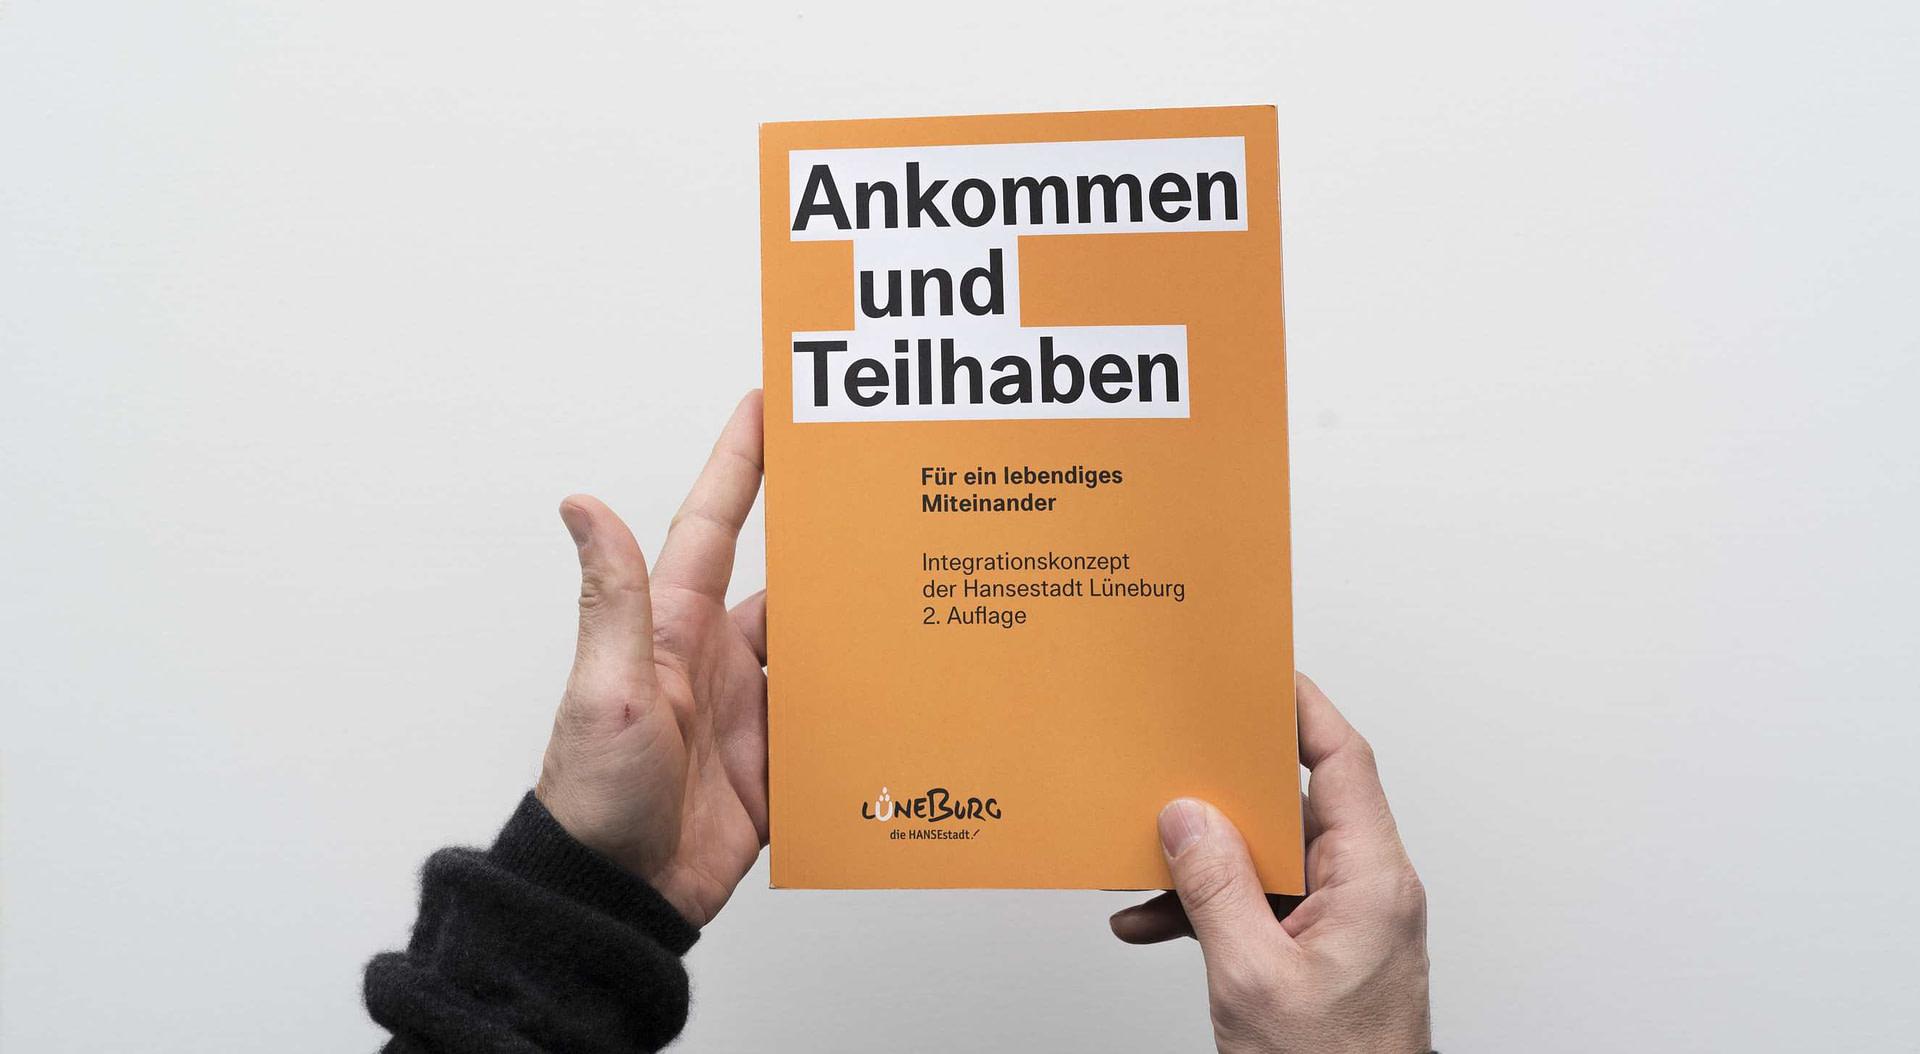 integrationskonzept-lueneburg-1.tiff-2650x1455px